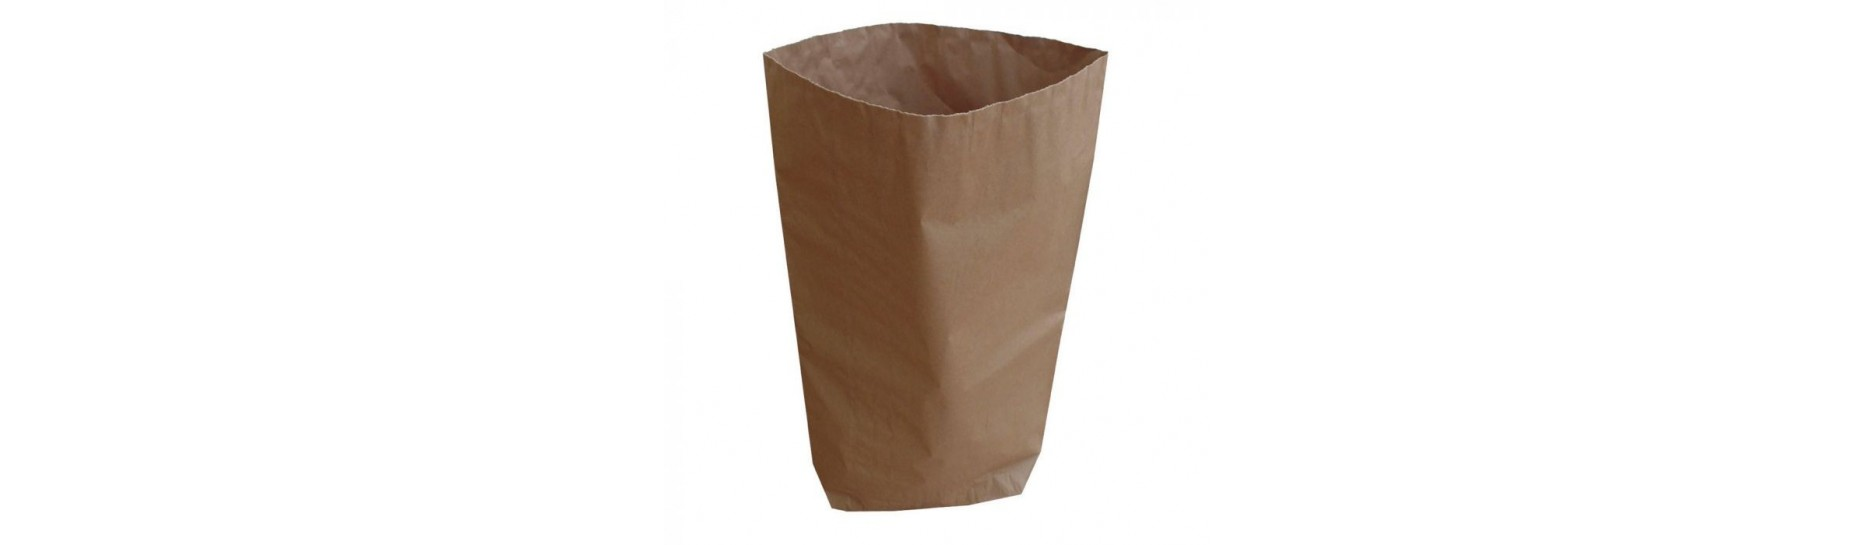 Papírové pytle